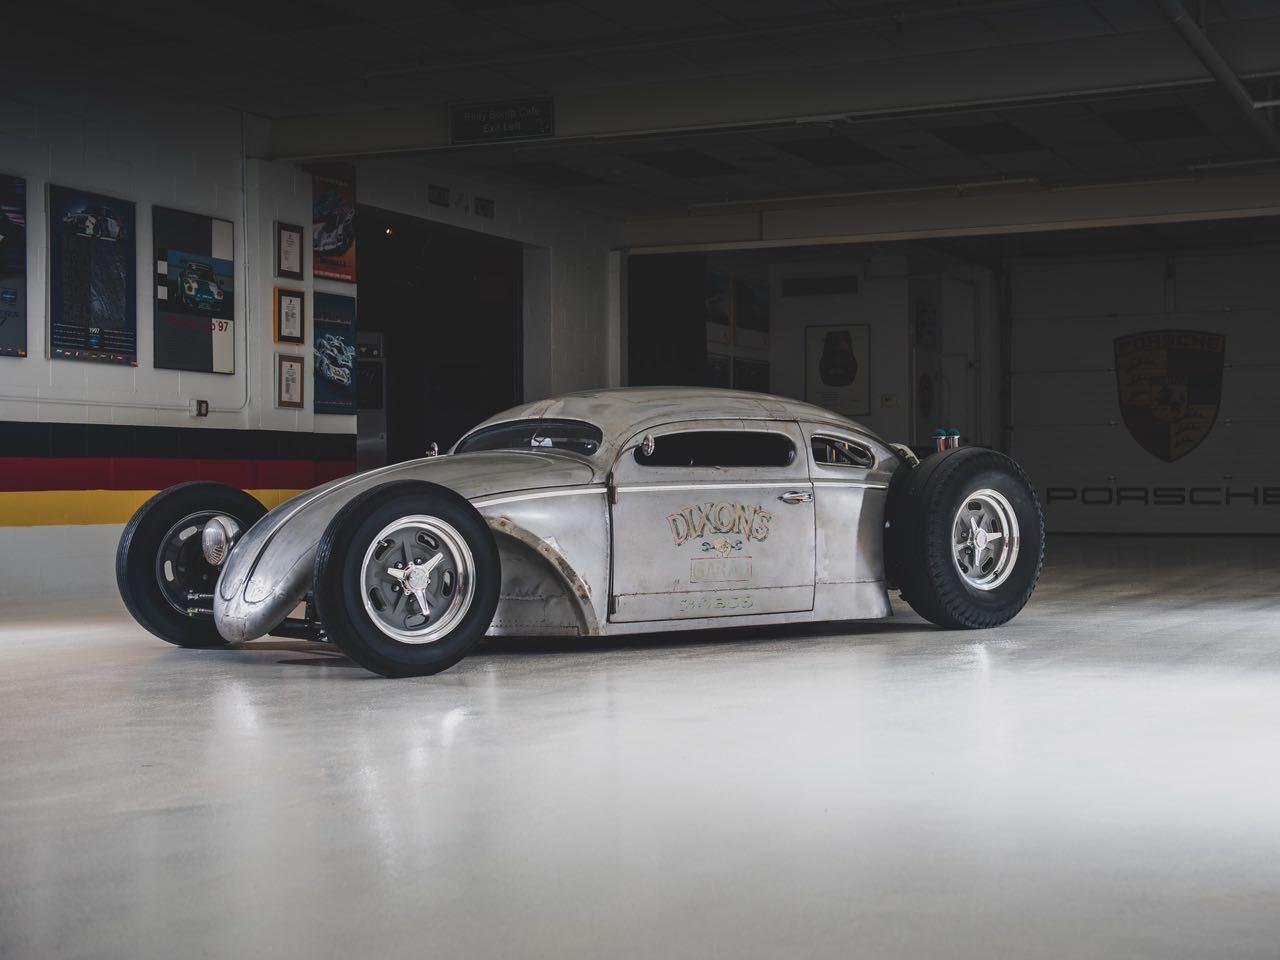 "'56 VW Beetle Outlaw ""Death"" by Franz Muhr - Heavy Metal ! 4"